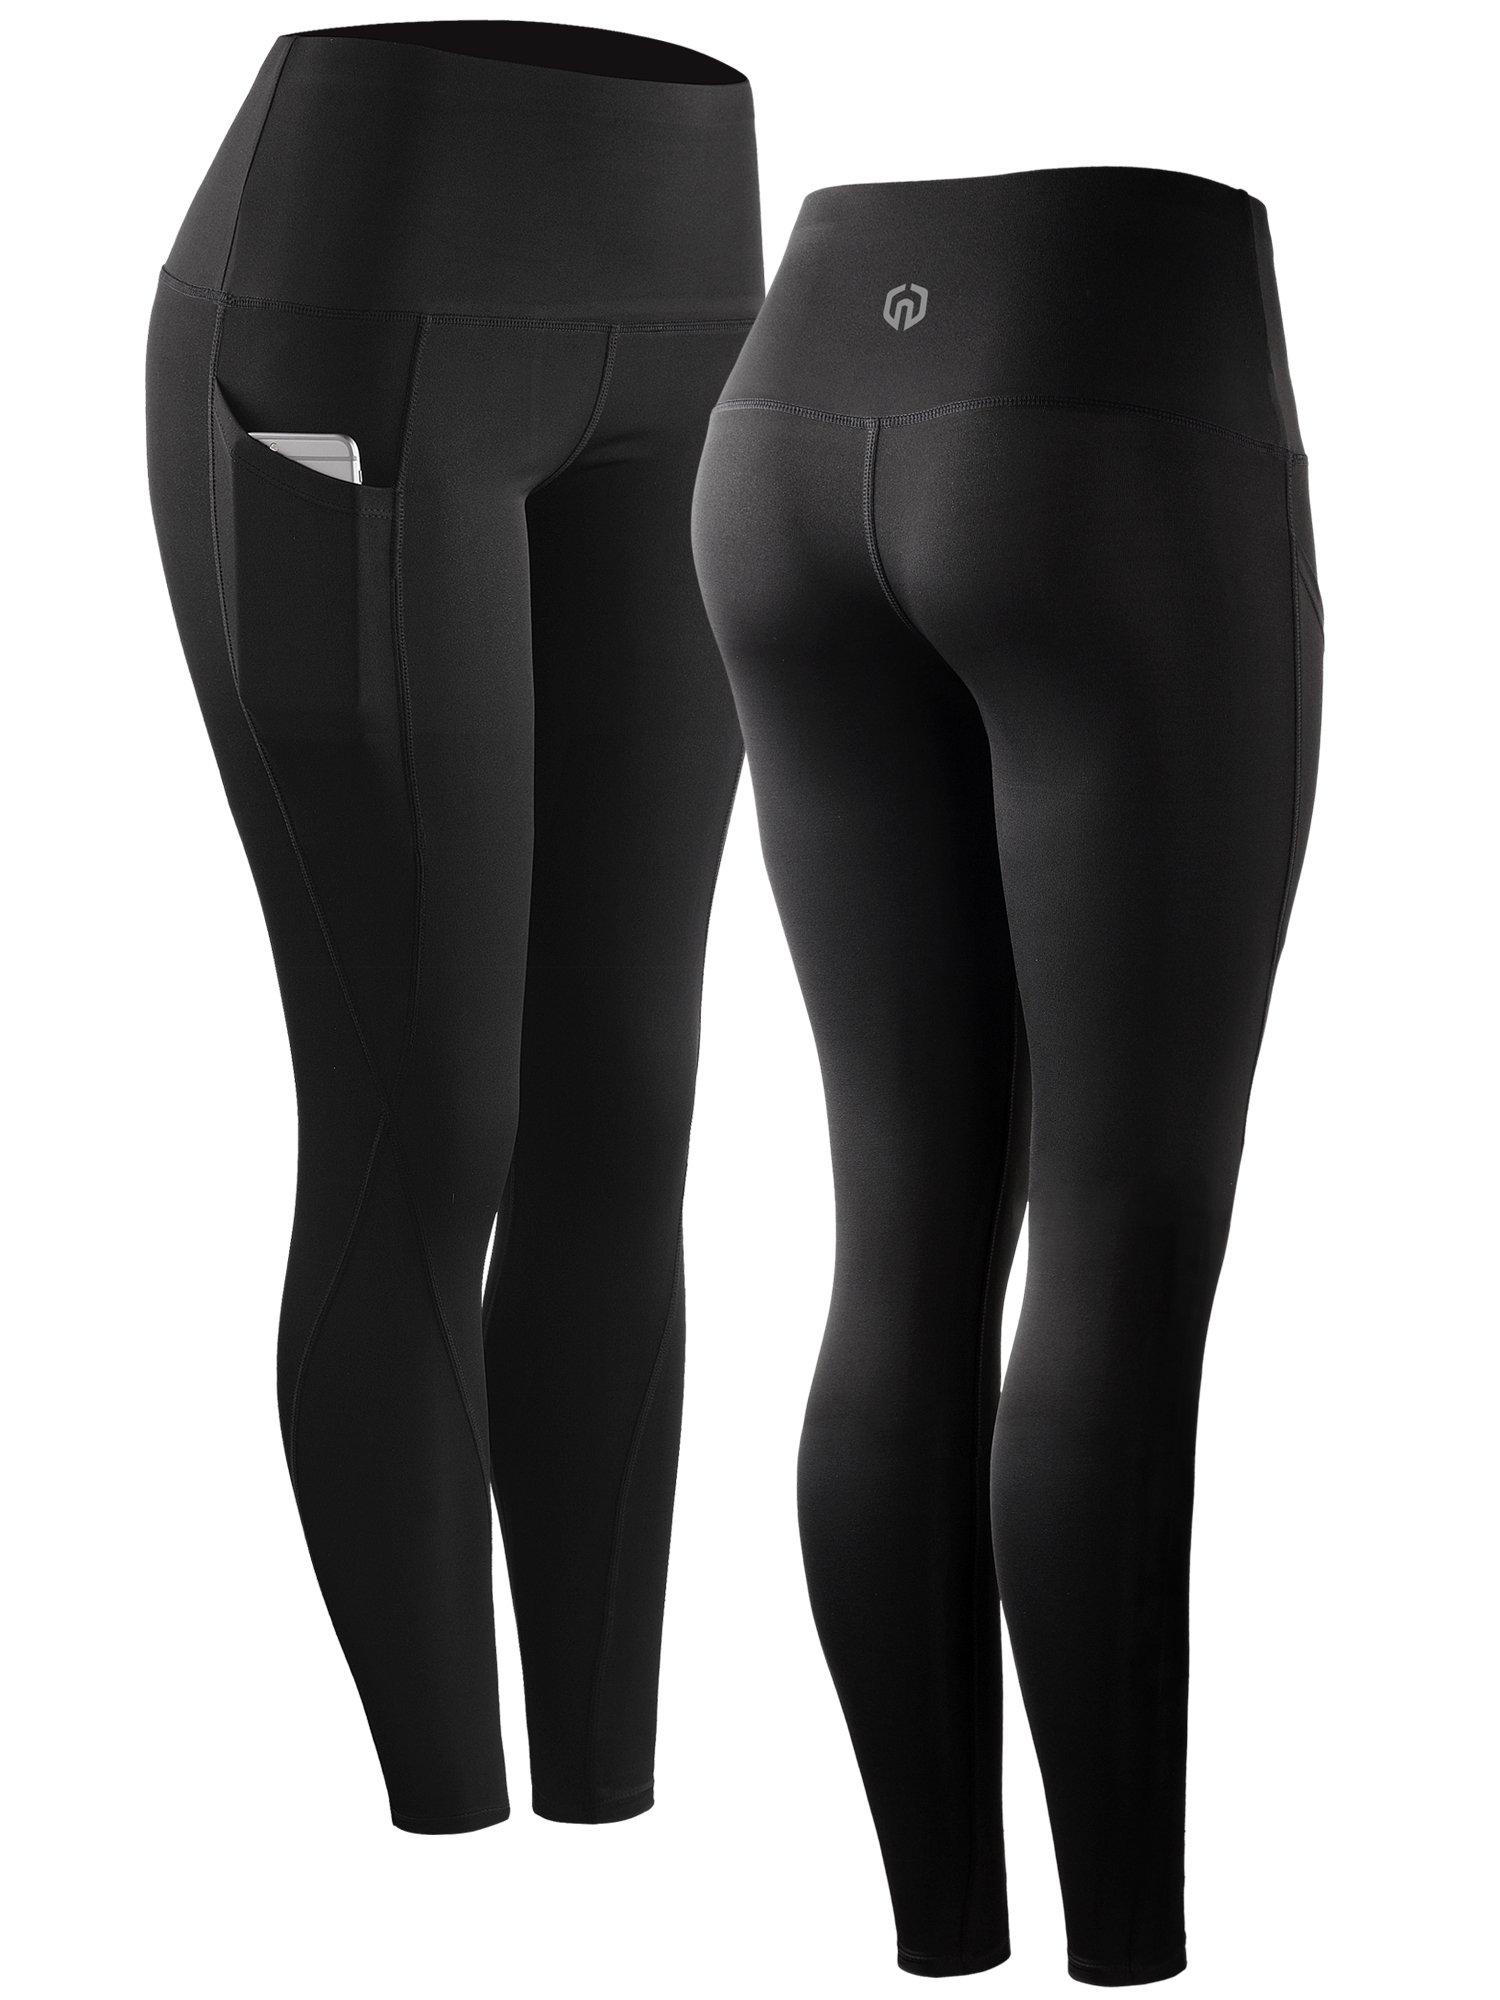 Neleus Tummy Control High Waist Running Workout Leggings,9017,One Piece,Black,S,EU M by Neleus (Image #4)